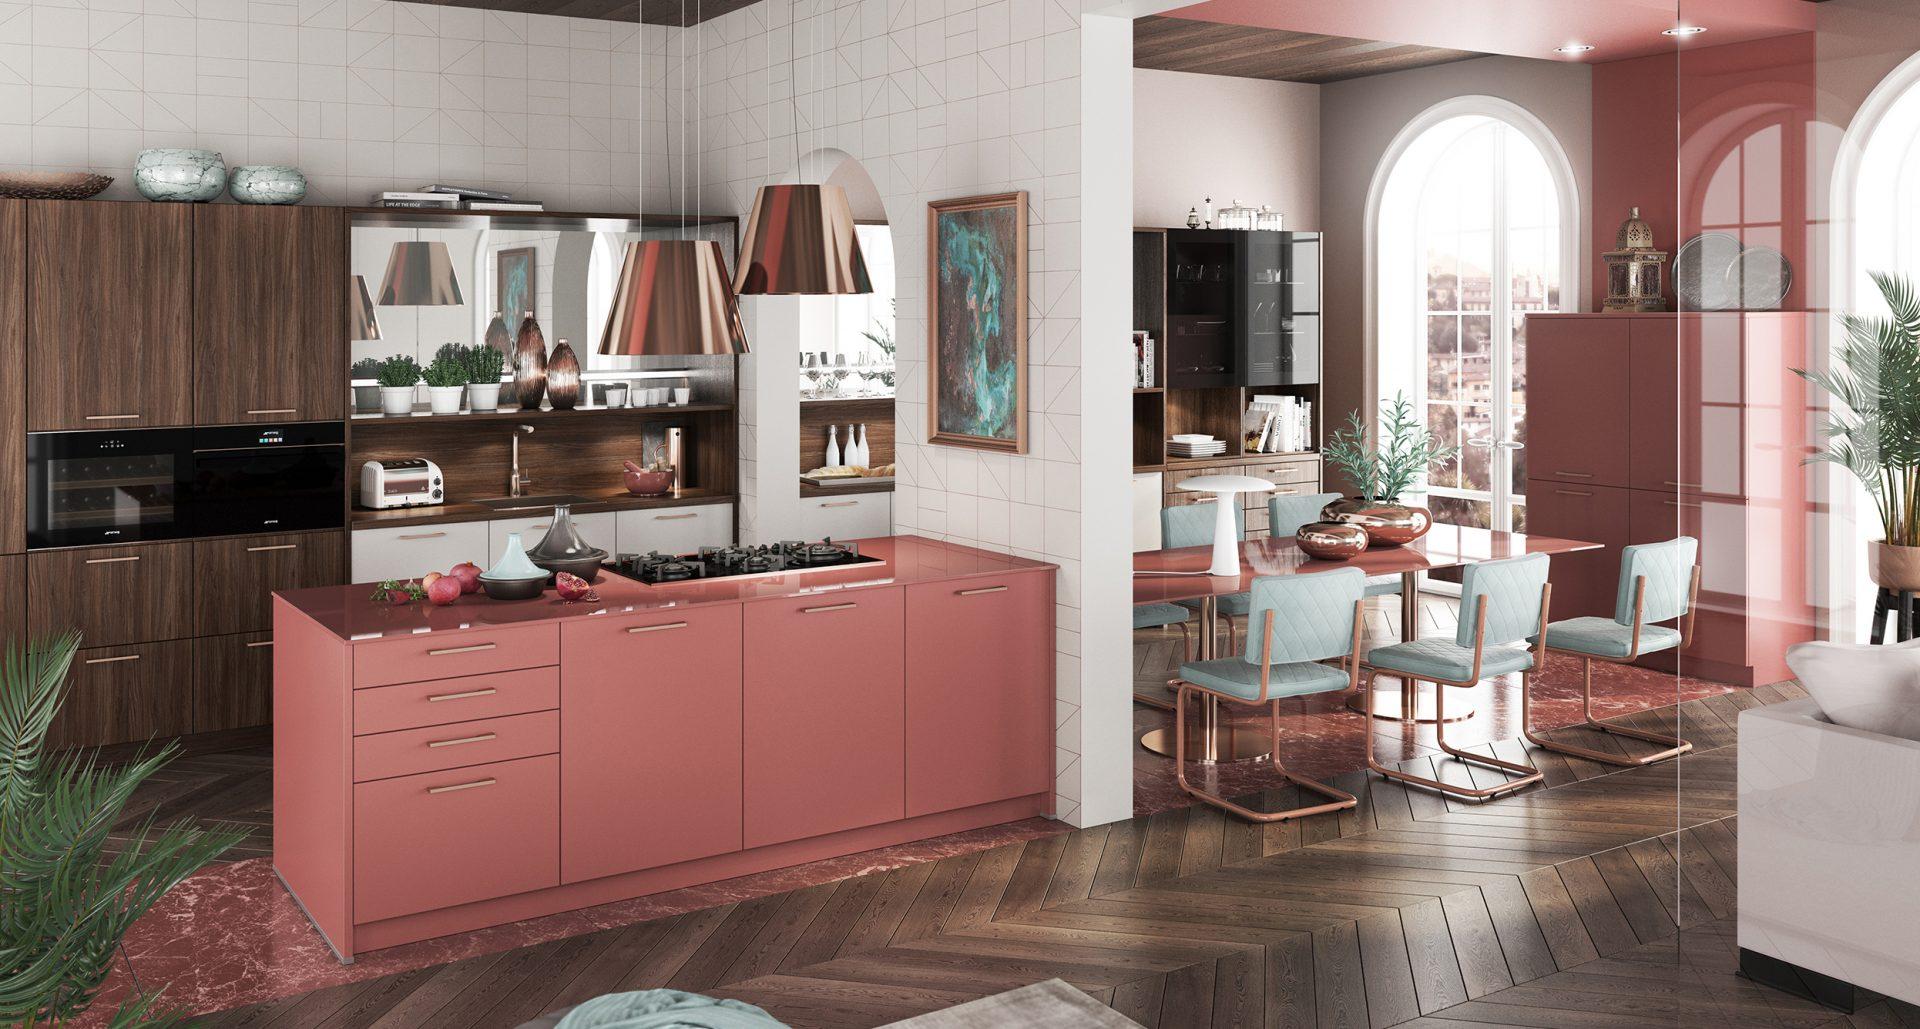 Full Size of Eckschrank Küche Eckschrank Küche Karussell Ersatzteile Drehboden Eckschrank Küche Eckschrank Küche Hängend Küche Eckschrank Küche